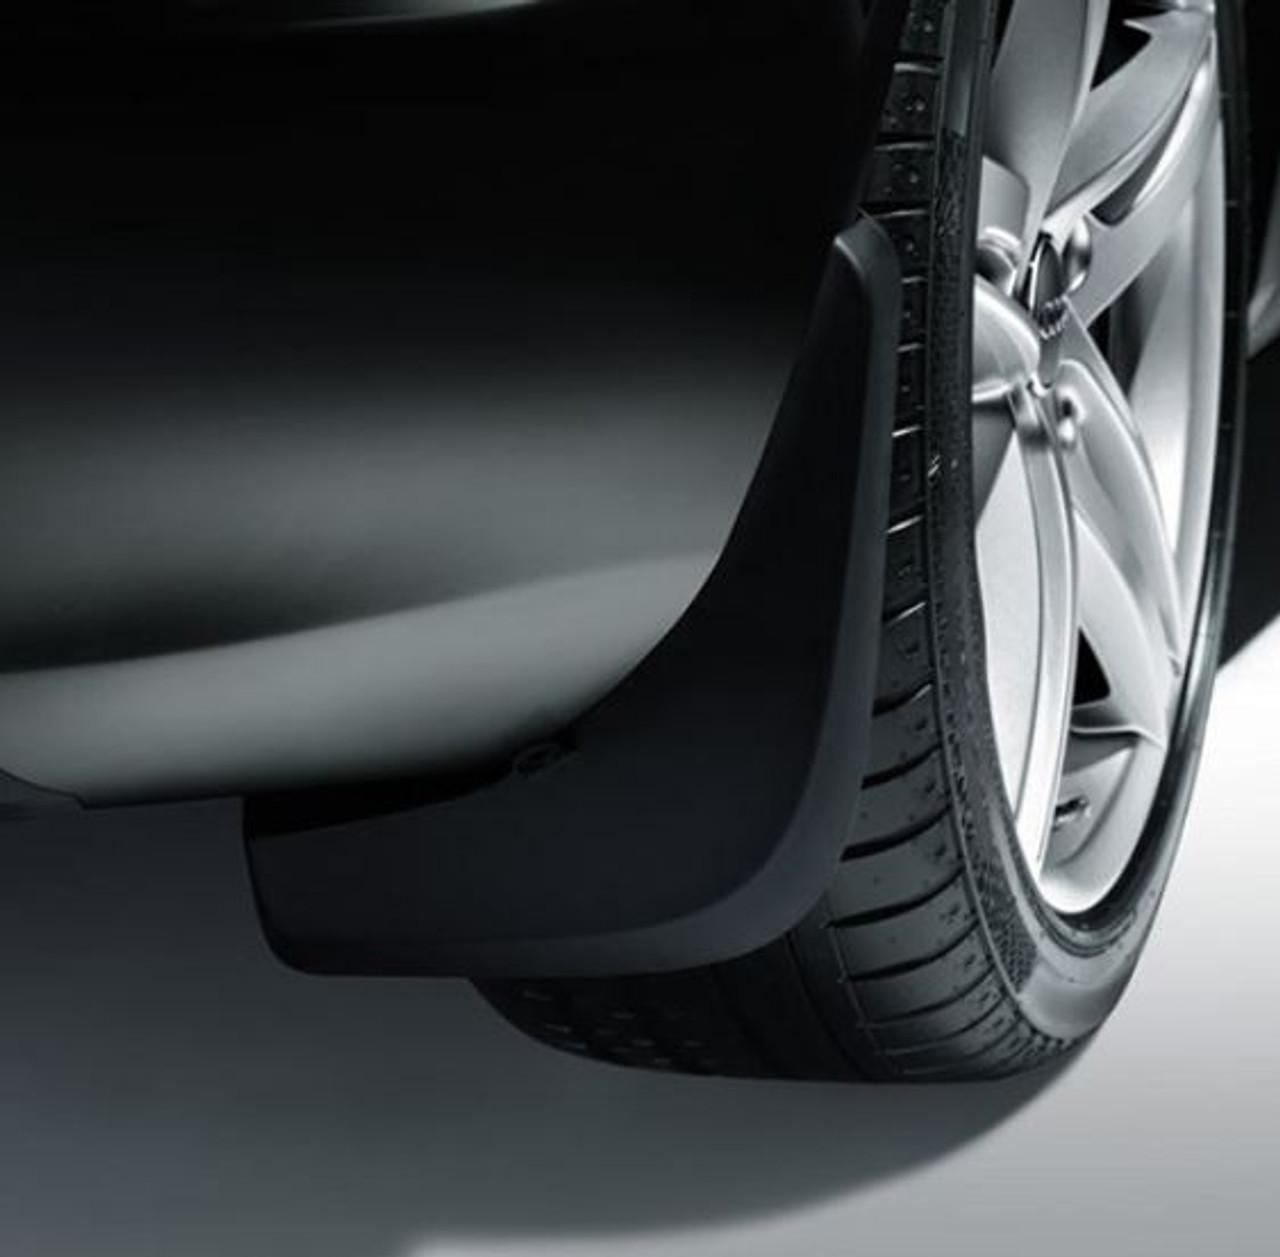 Audi A5 Rear Mud Flap Set 2017+ 8W6075101